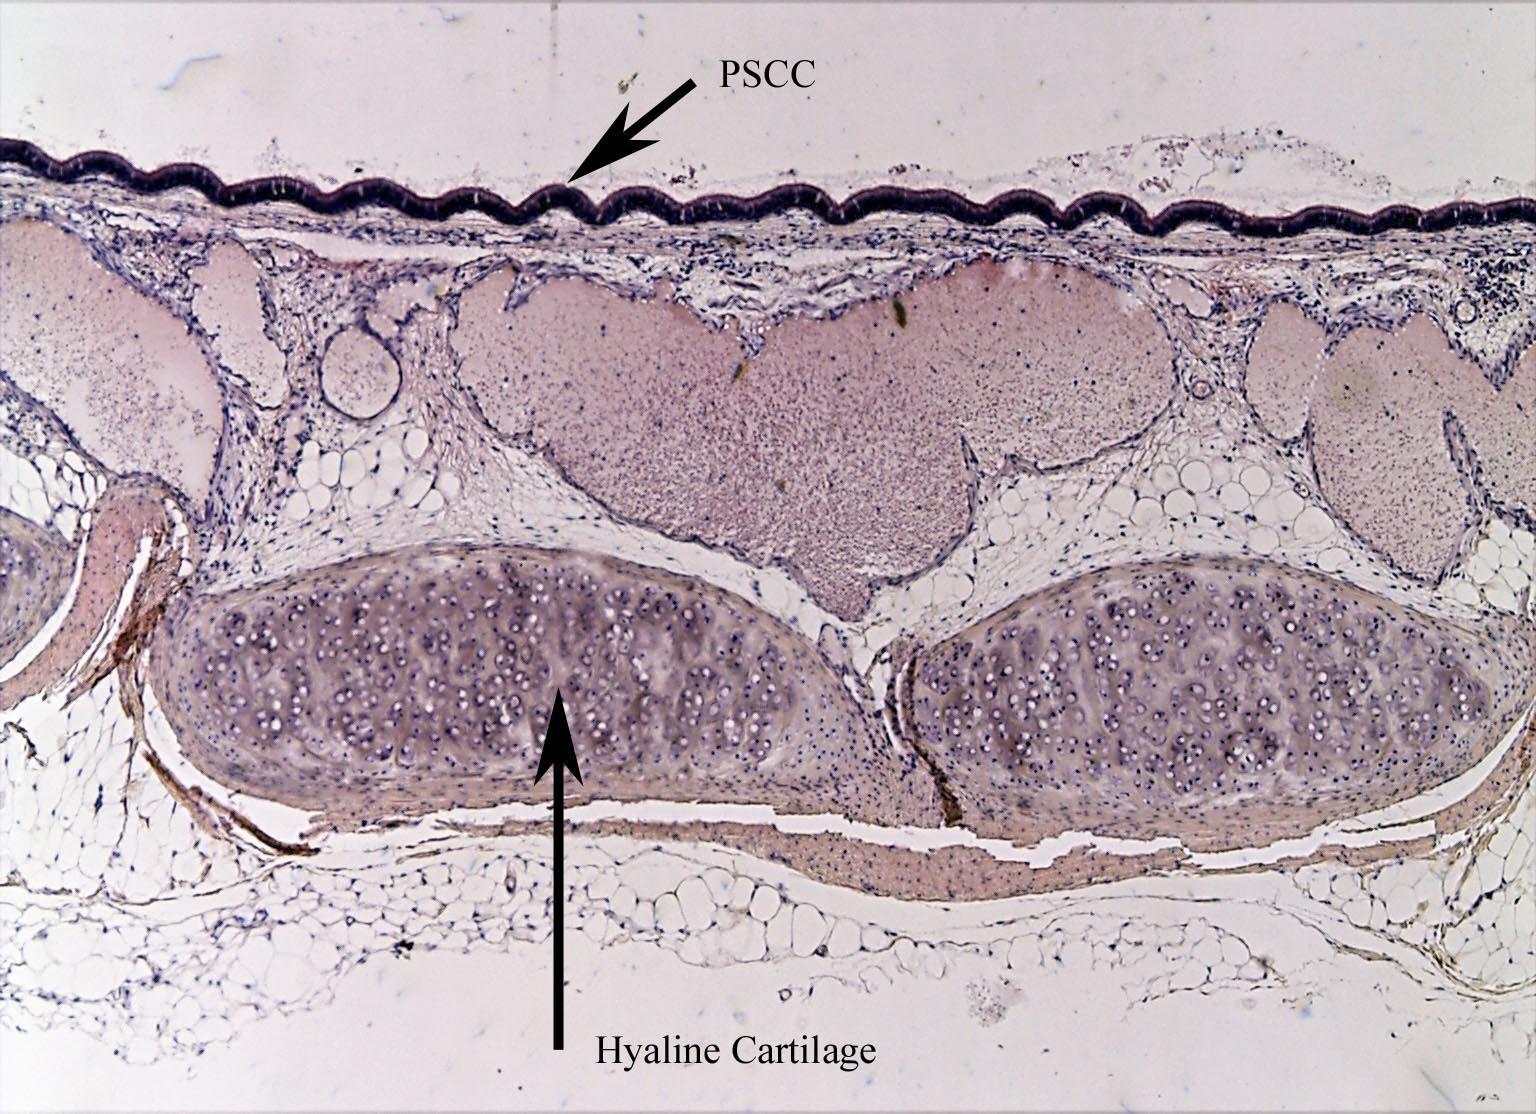 trachea_low.jpg 1,536×1,114 pixels | Anatomy 2 Lab Practical | Pinterest